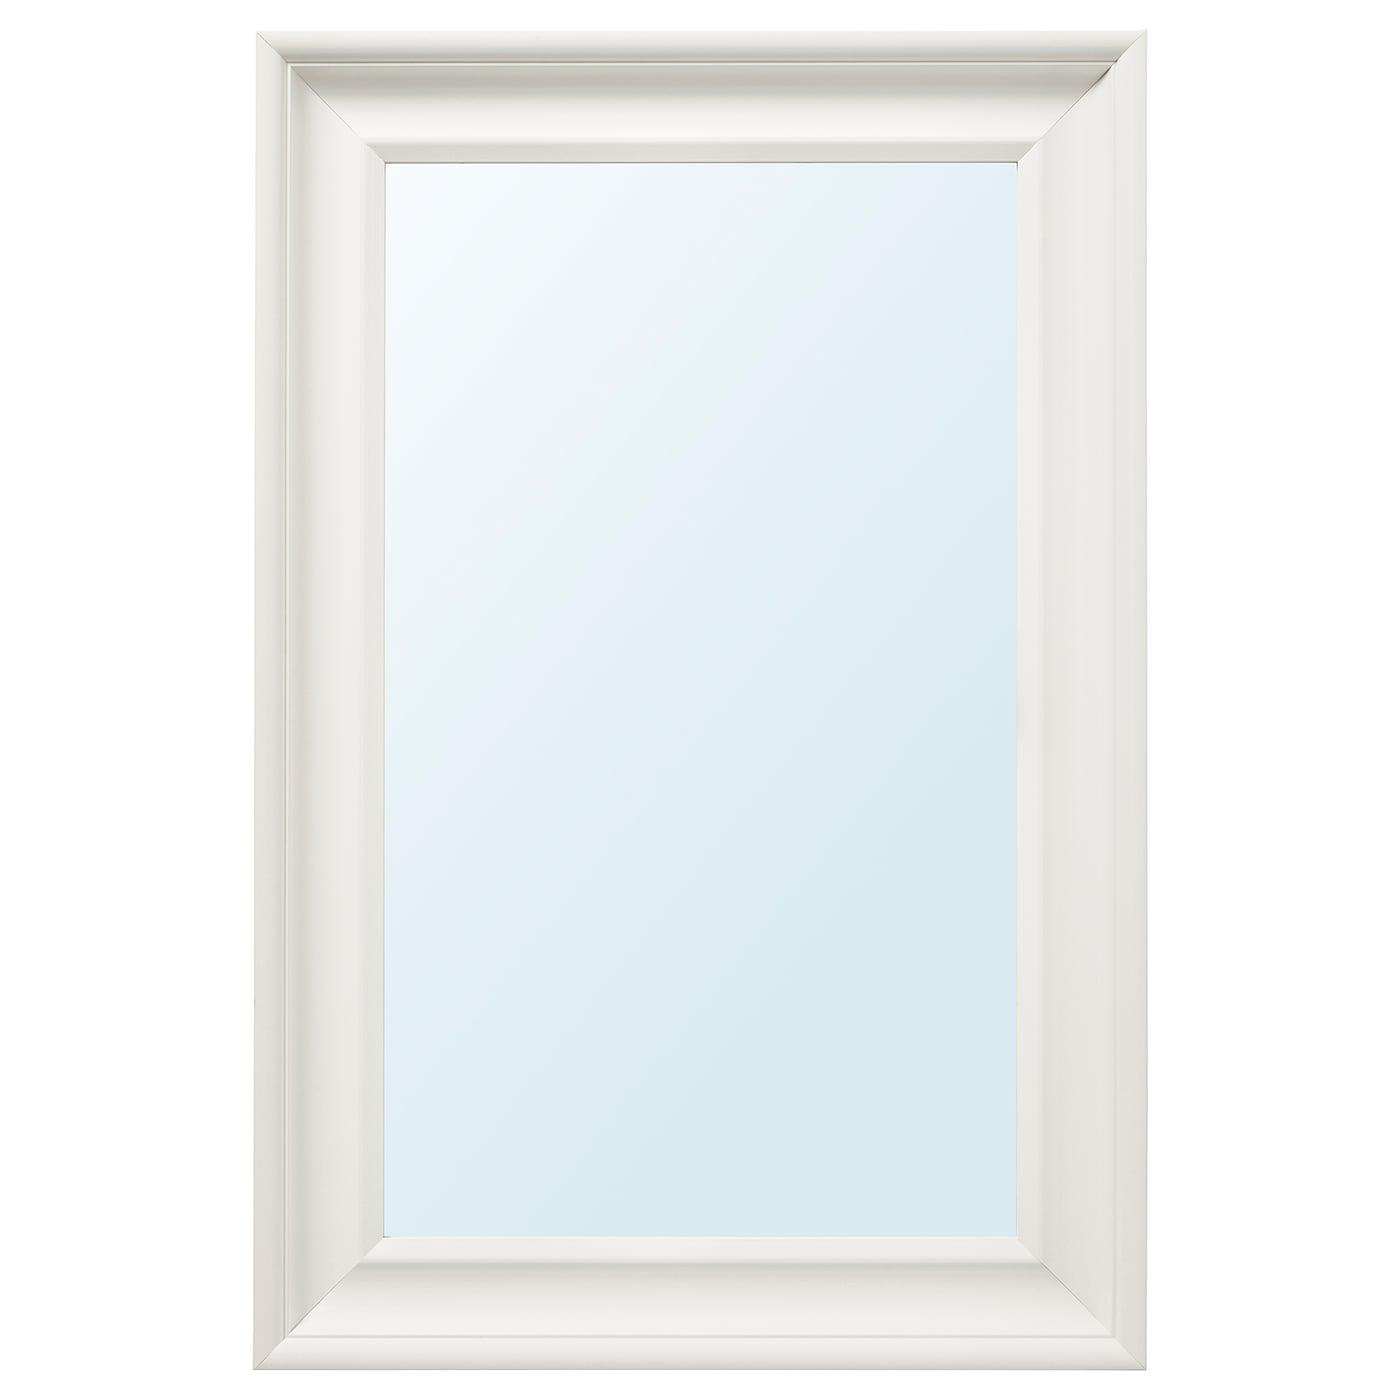 Hemnes espejo blanco 60 x 90 cm ikea - Espejo hemnes blanco ...